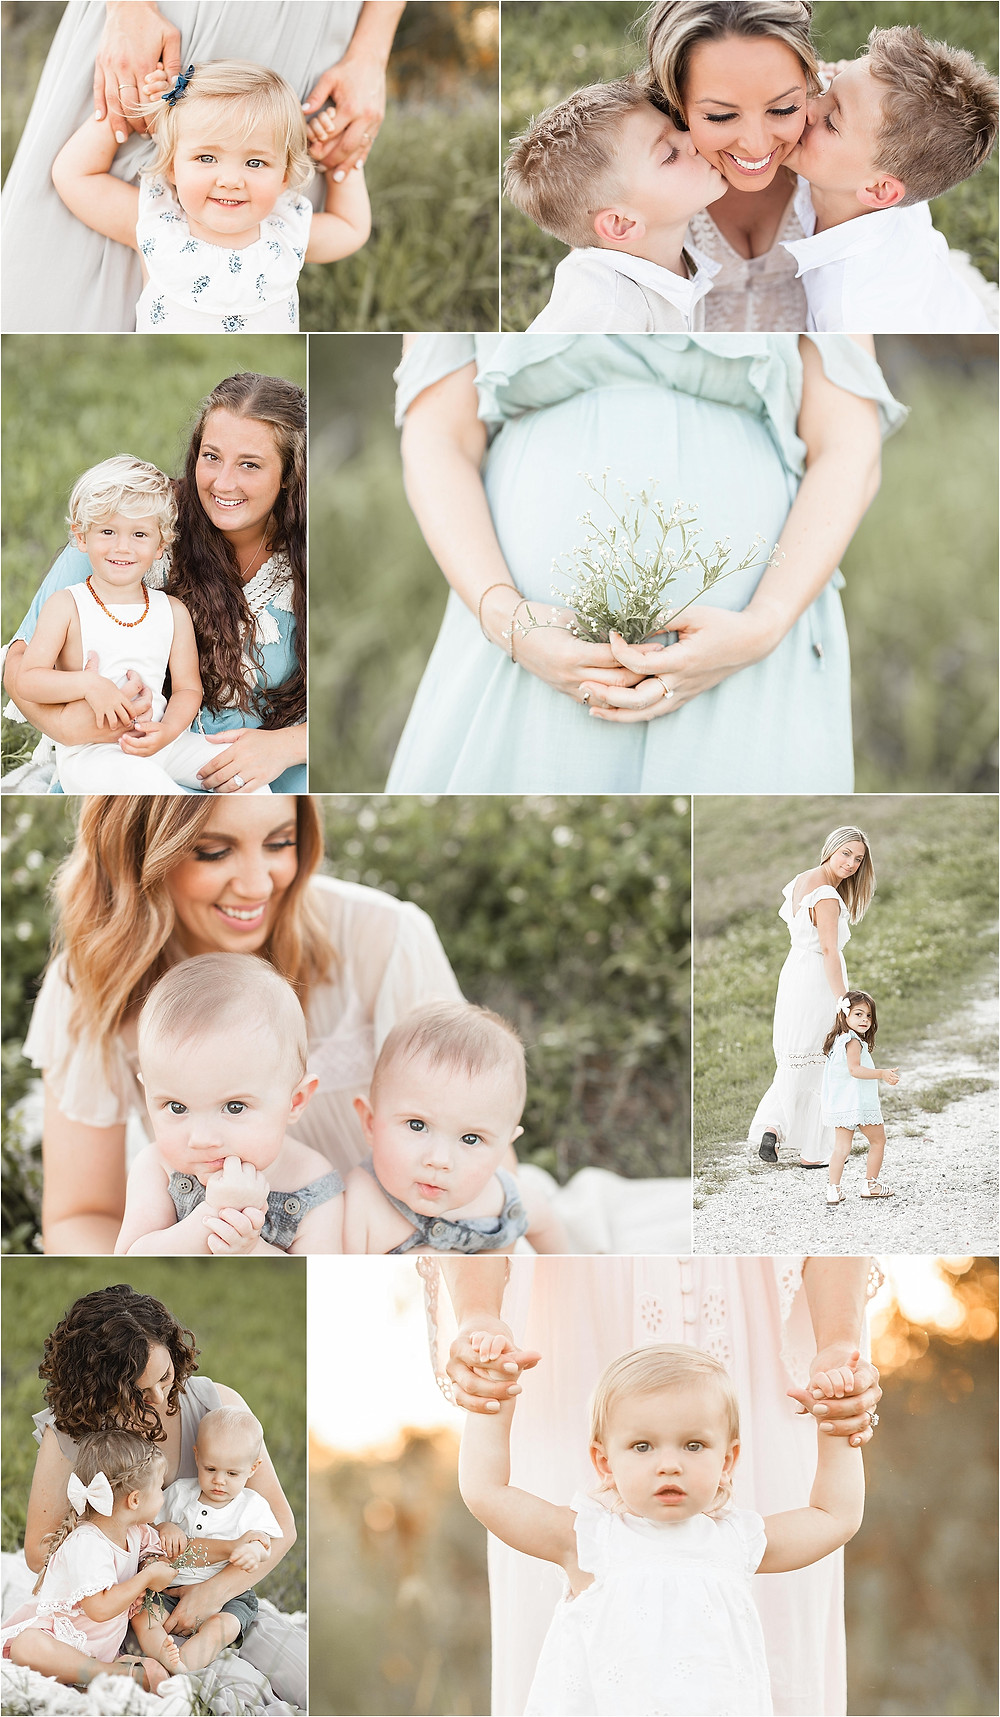 motherhood event glimpse | best family photographer in sarasota